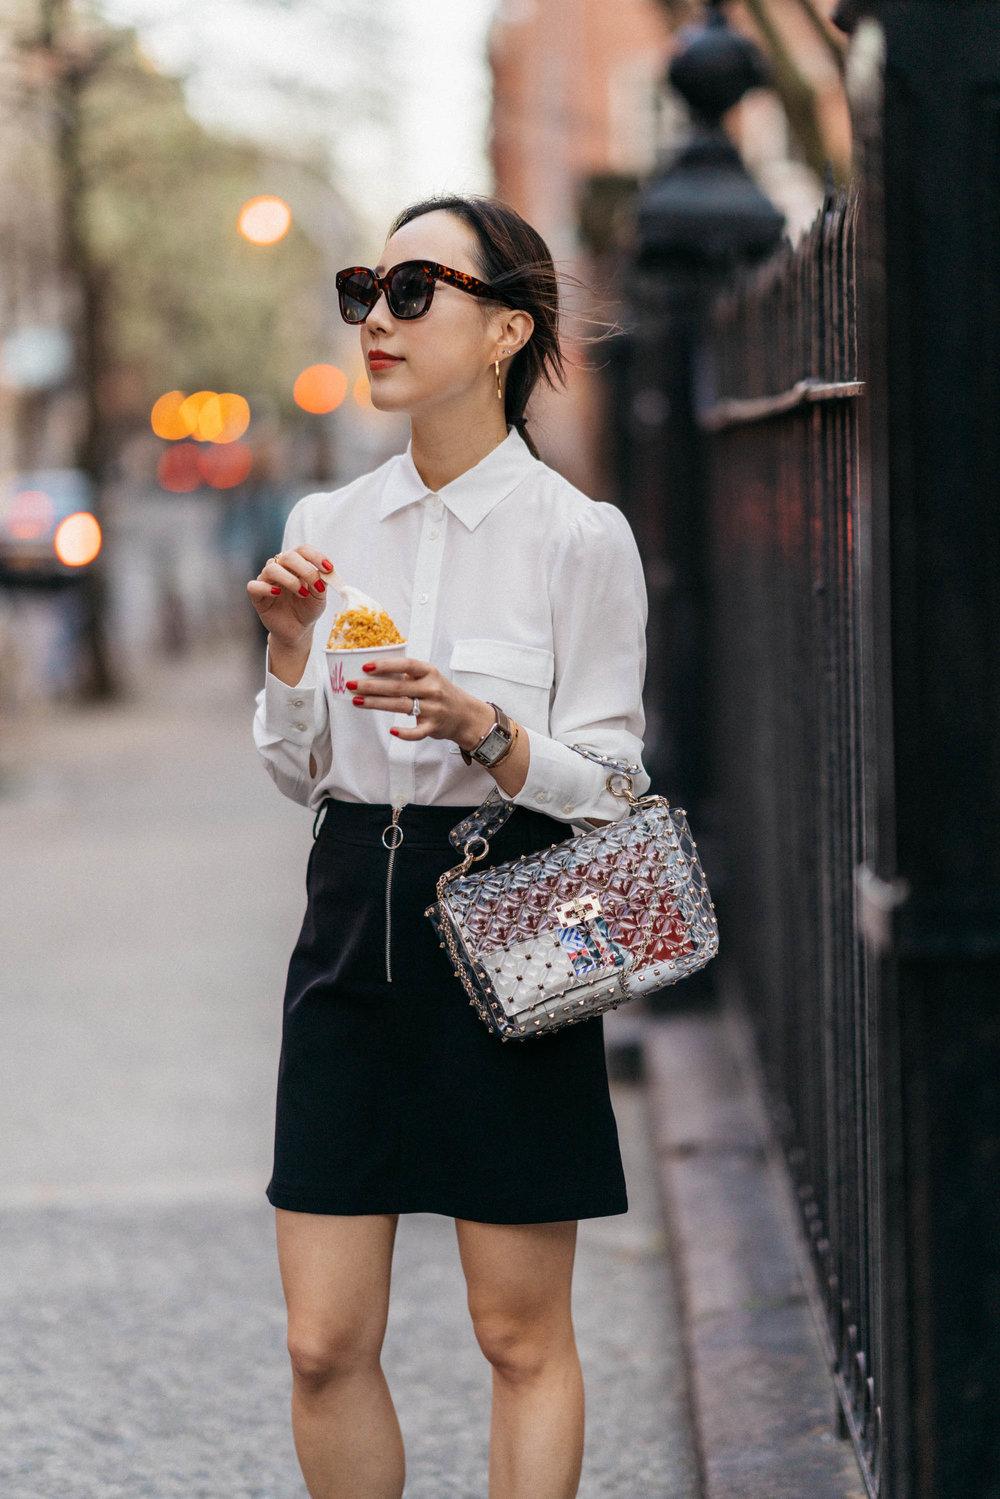 Eating Cereal Milk Soft Serve from  Milk Bar   Wearing  Petite Studio Shirt ,  Petite Studio Skirt ,  Valentino Bag ,  Céline Sunglasses